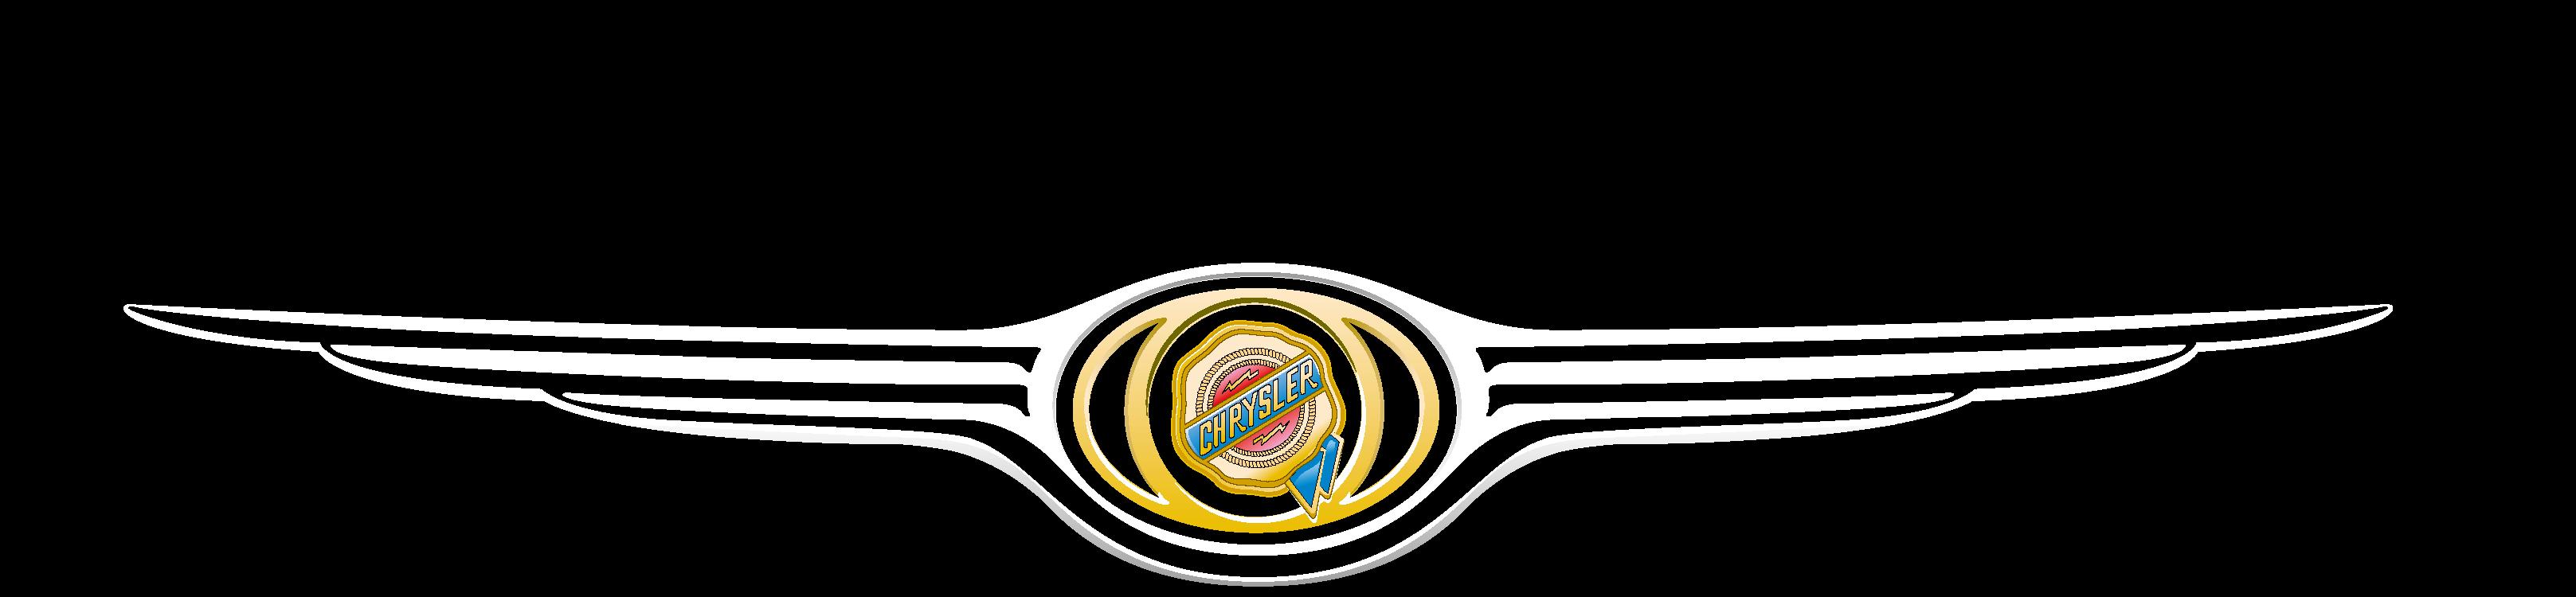 Chrysler Car Png Images Free Download - Chrysler Logo PNG